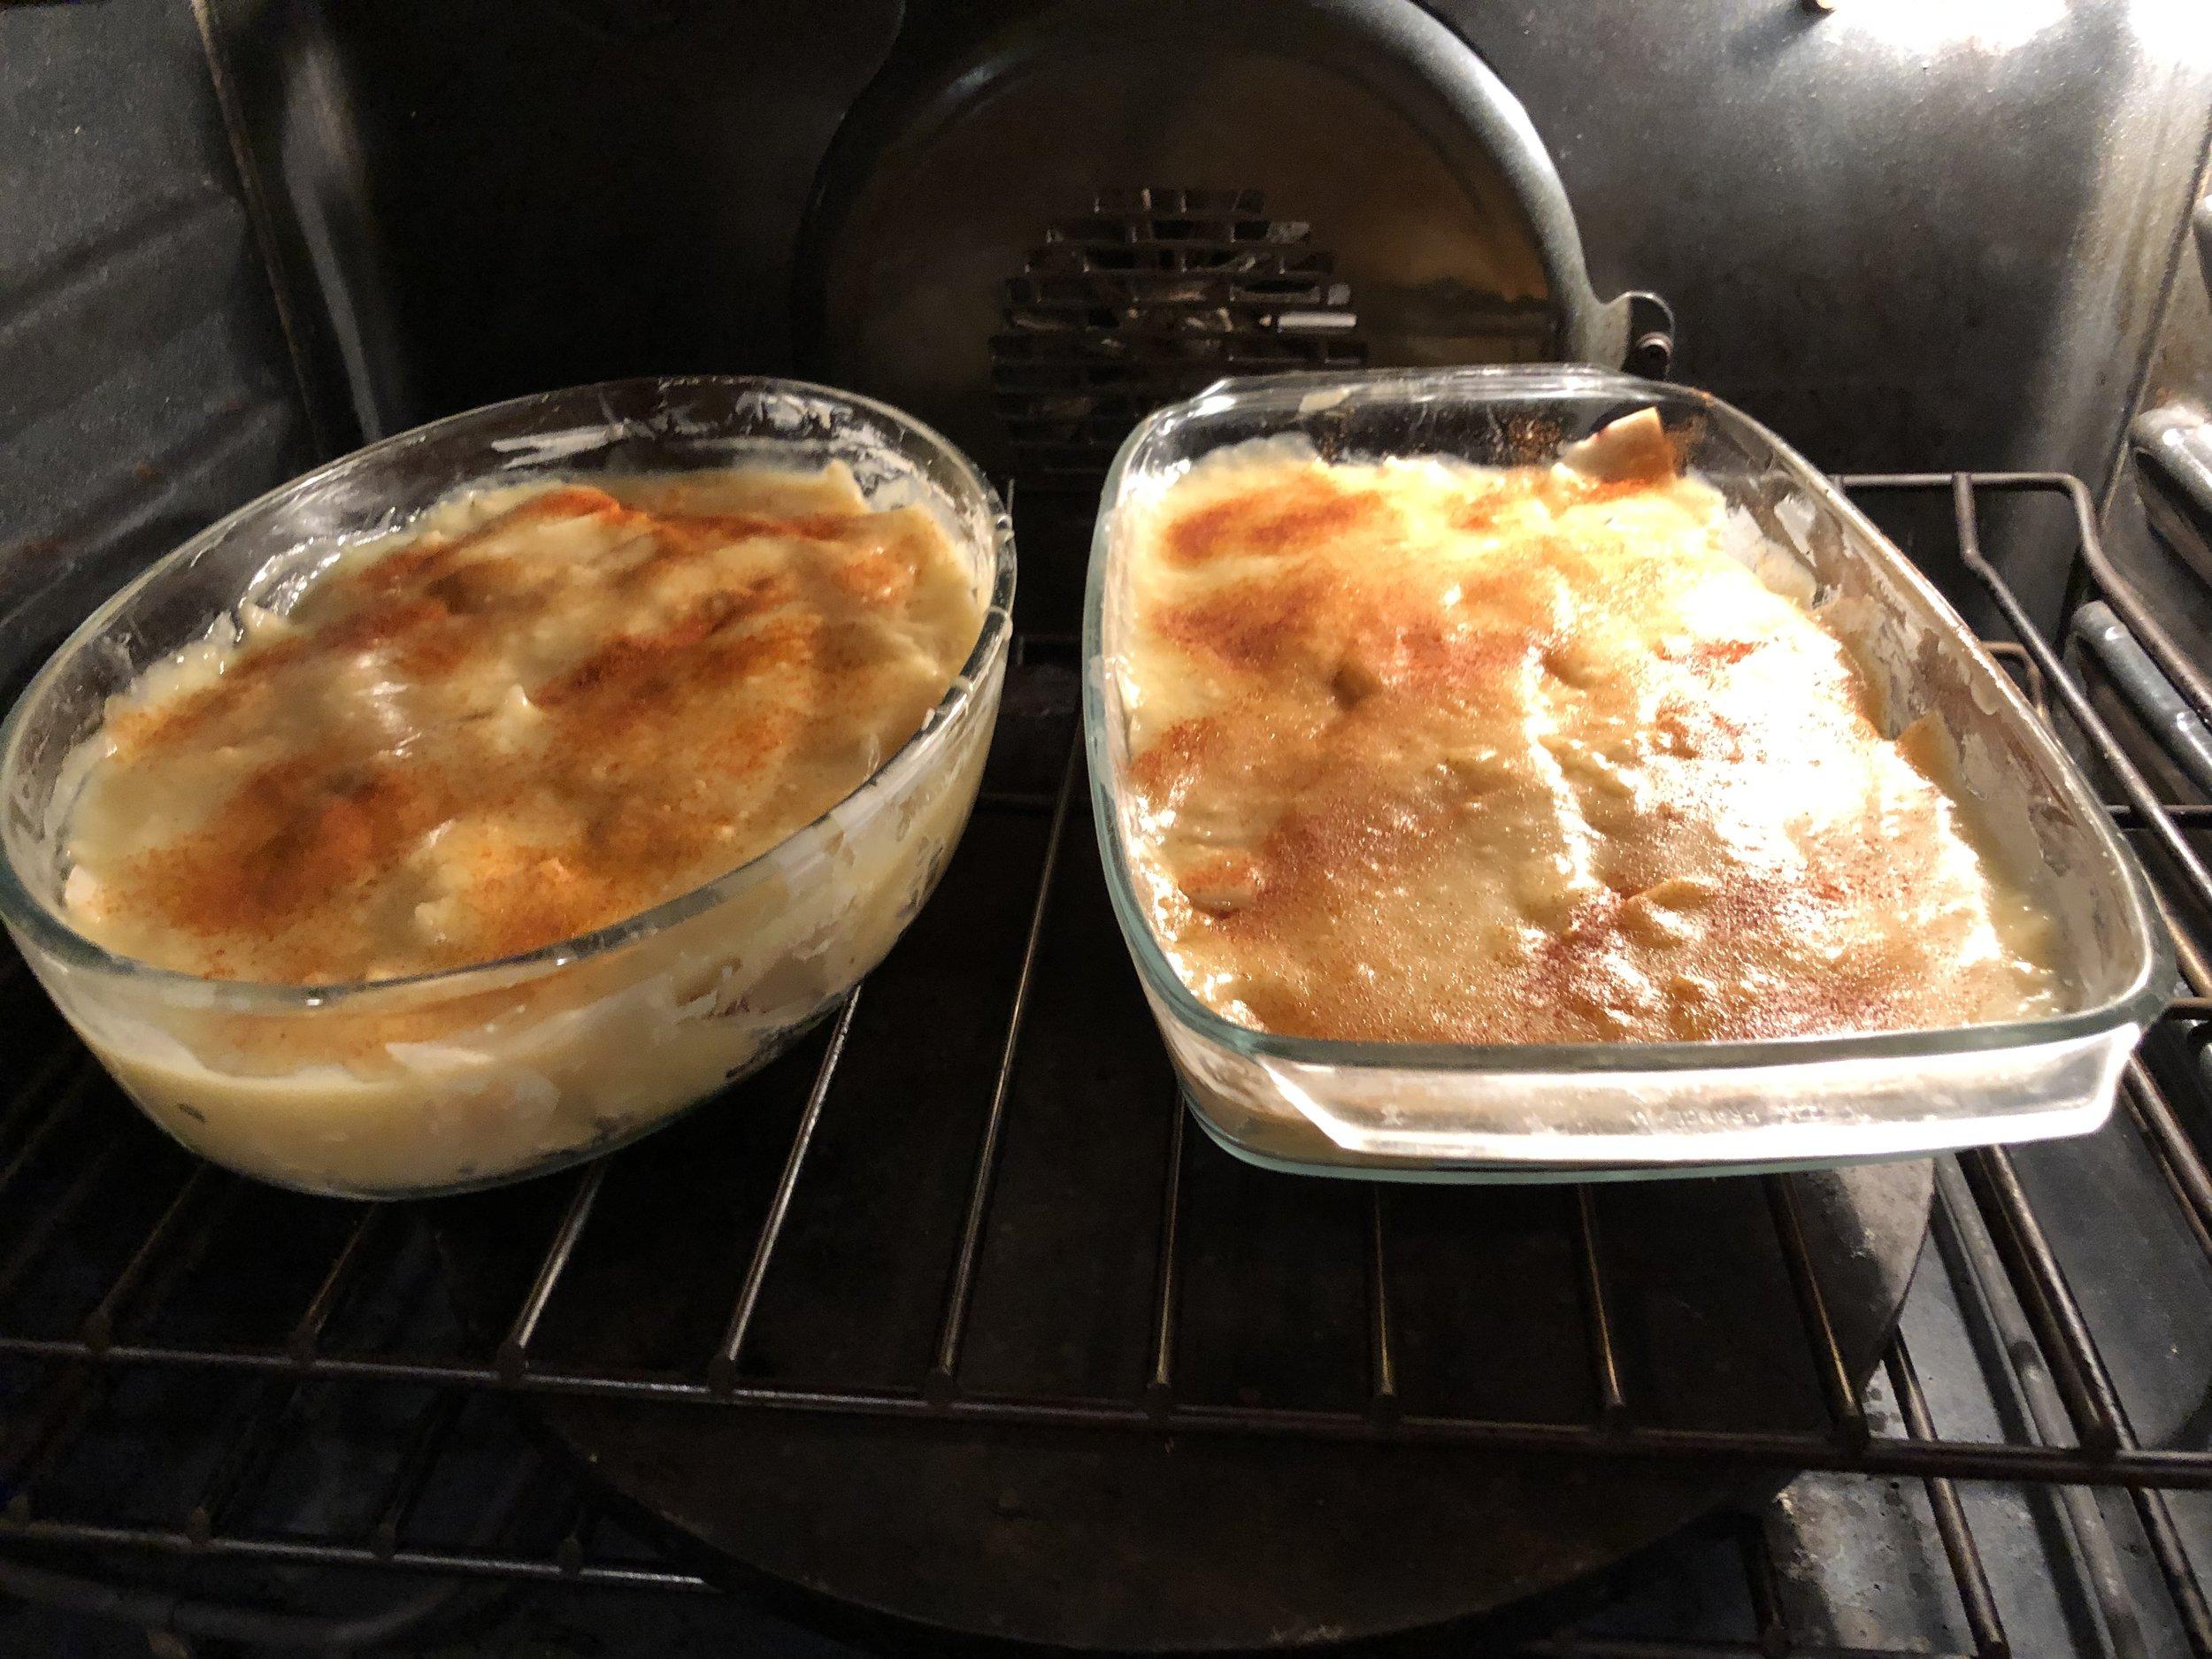 Ready to bake scalloped potatoes